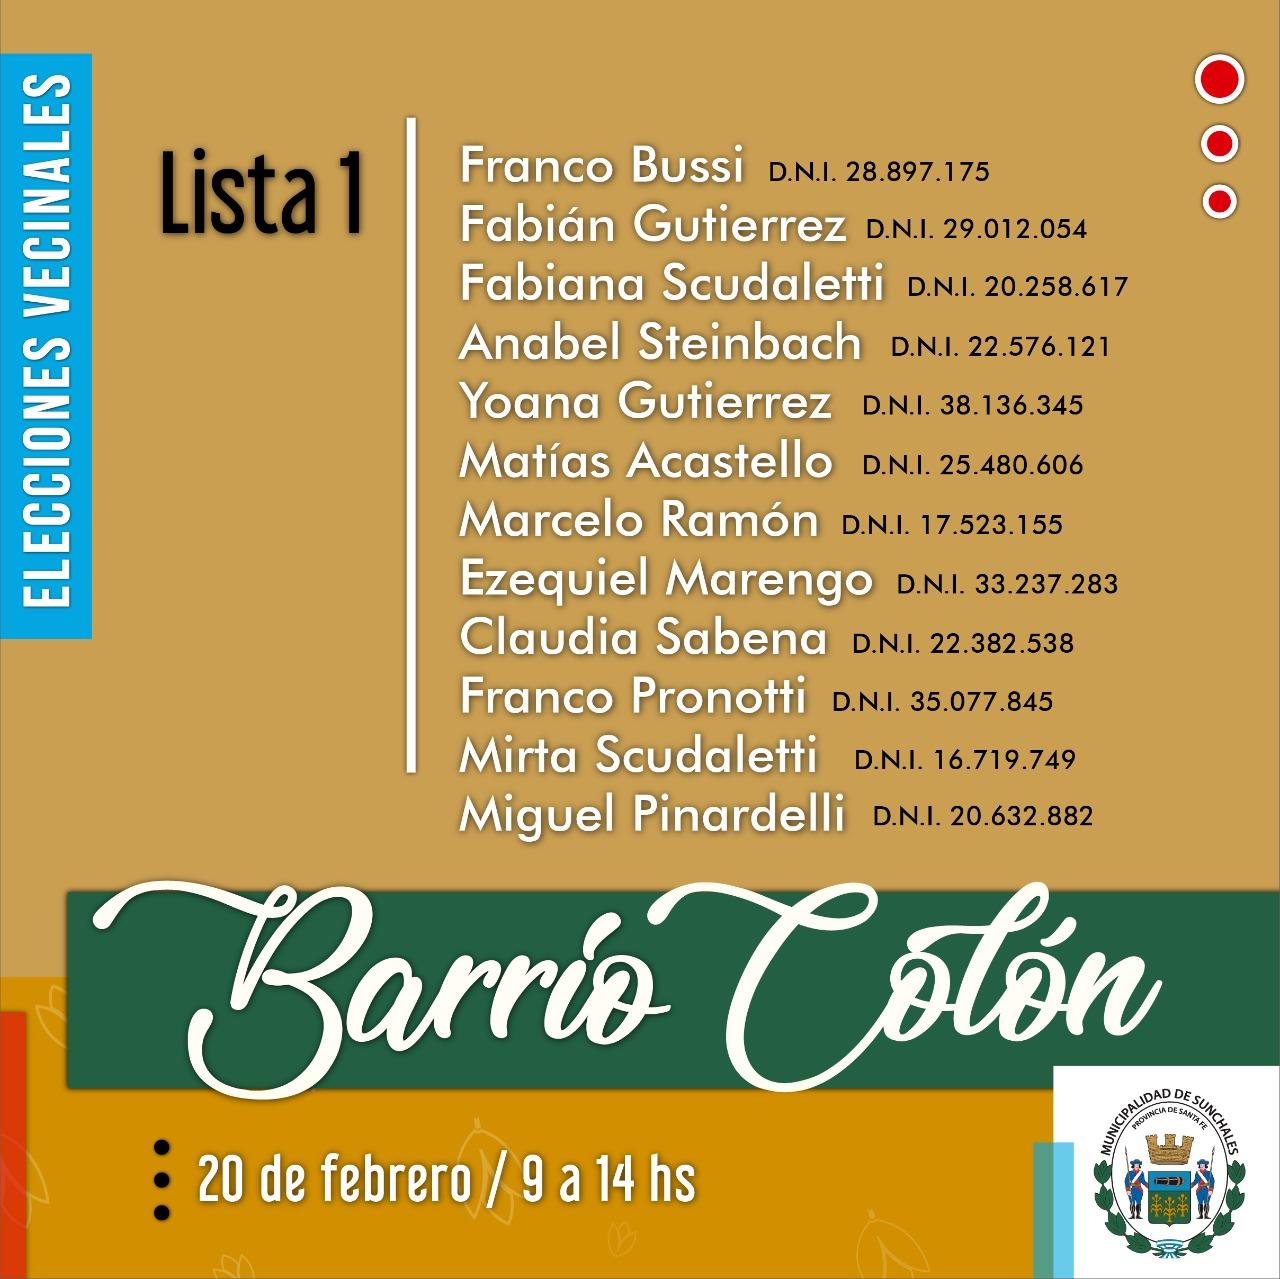 Lista 1 Colón